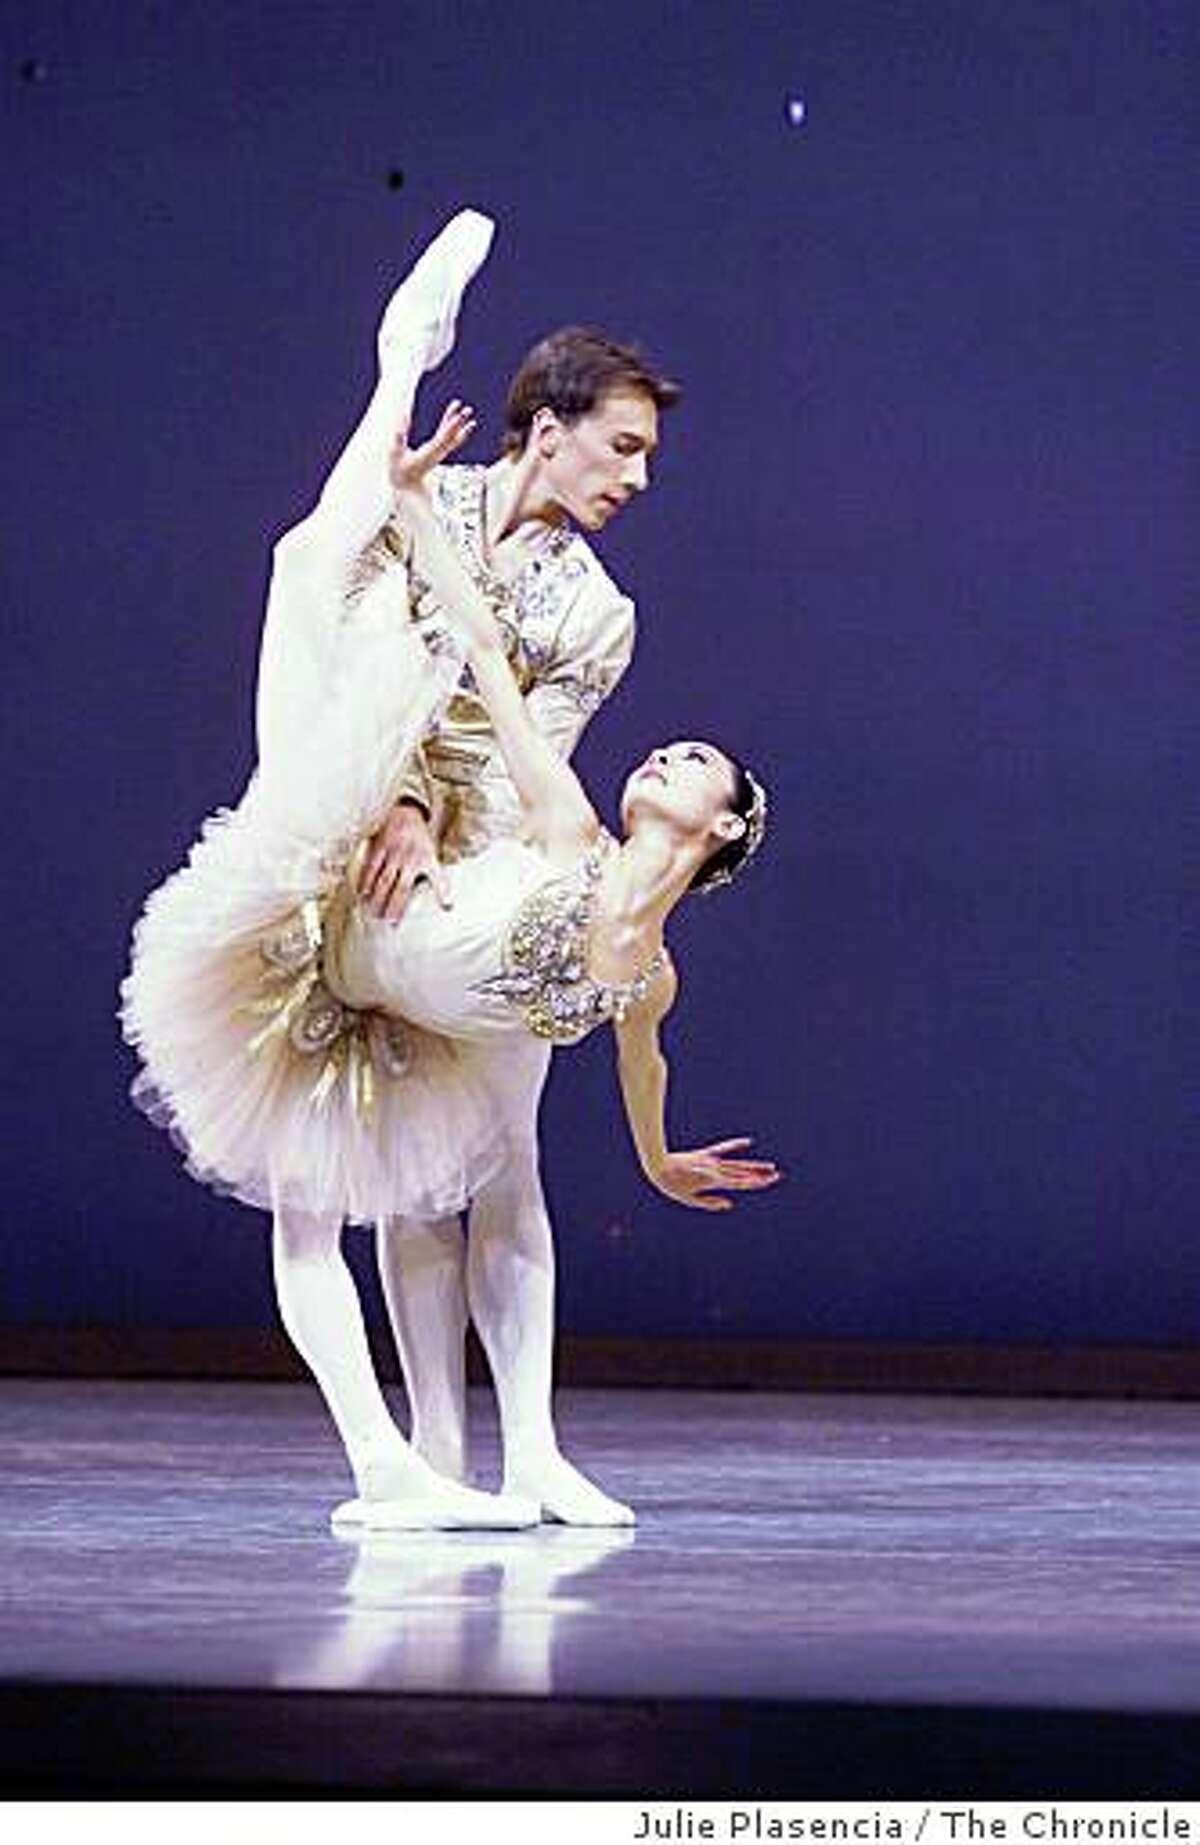 "JEWELS16h-C-12MAR02-DD-JP Principle dancers Yuan Yuan Tan and Roman Rykine in ""Diamonds"" segment of San Francisco Ballet's presentation of Jewels at the War Memorial Opera House in San Francisco. (JULIE PLASENCIA/SFC)"